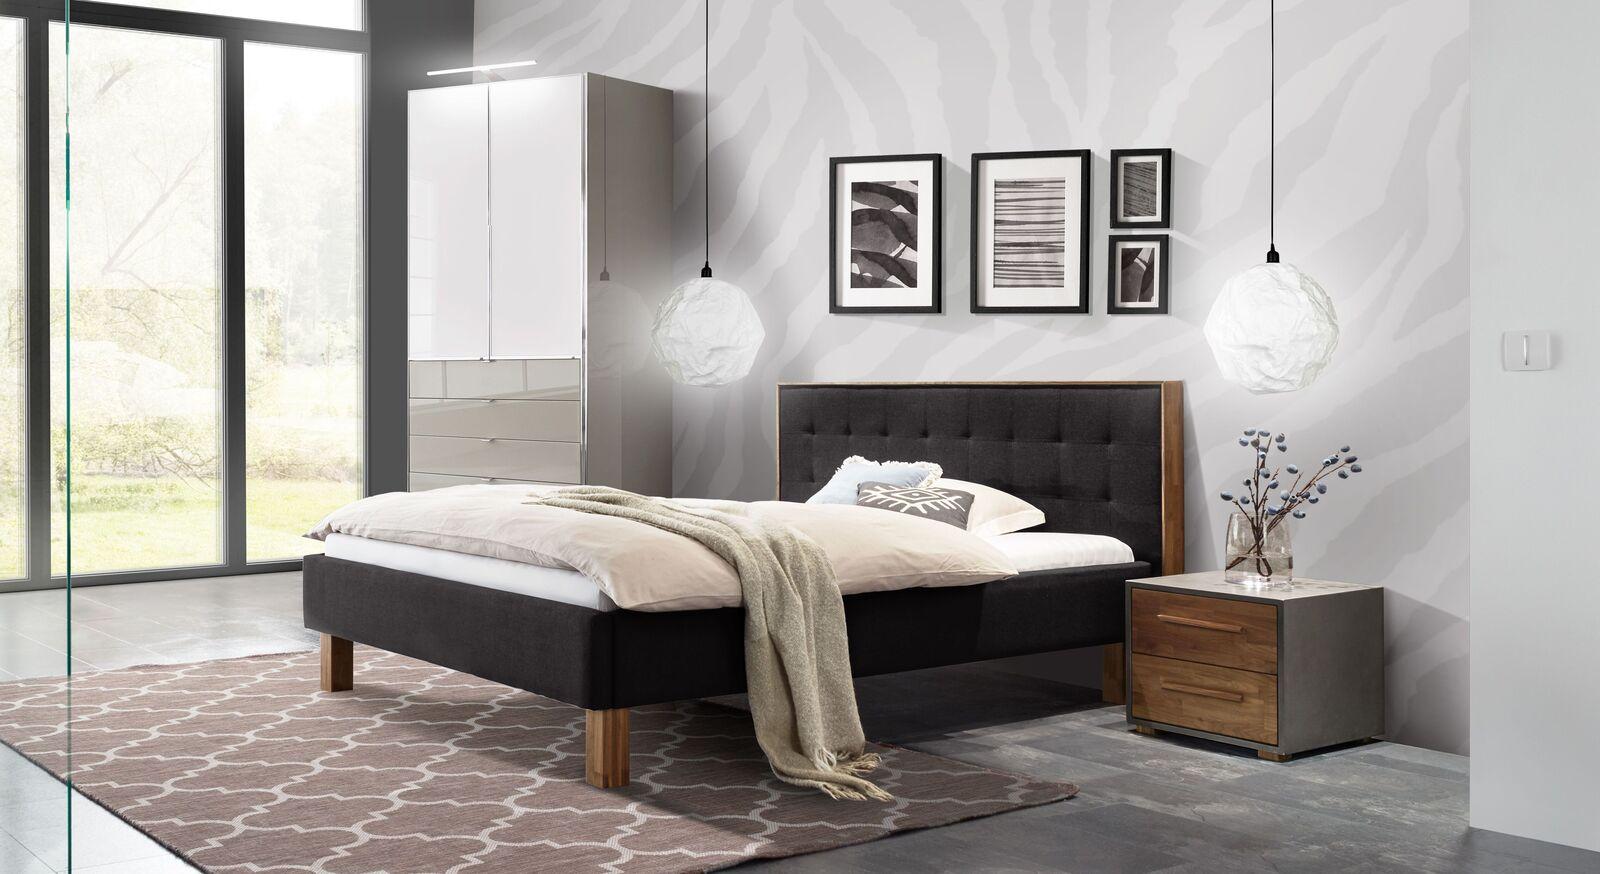 Schlafzimmer Cassian mit modernem Mobiliar